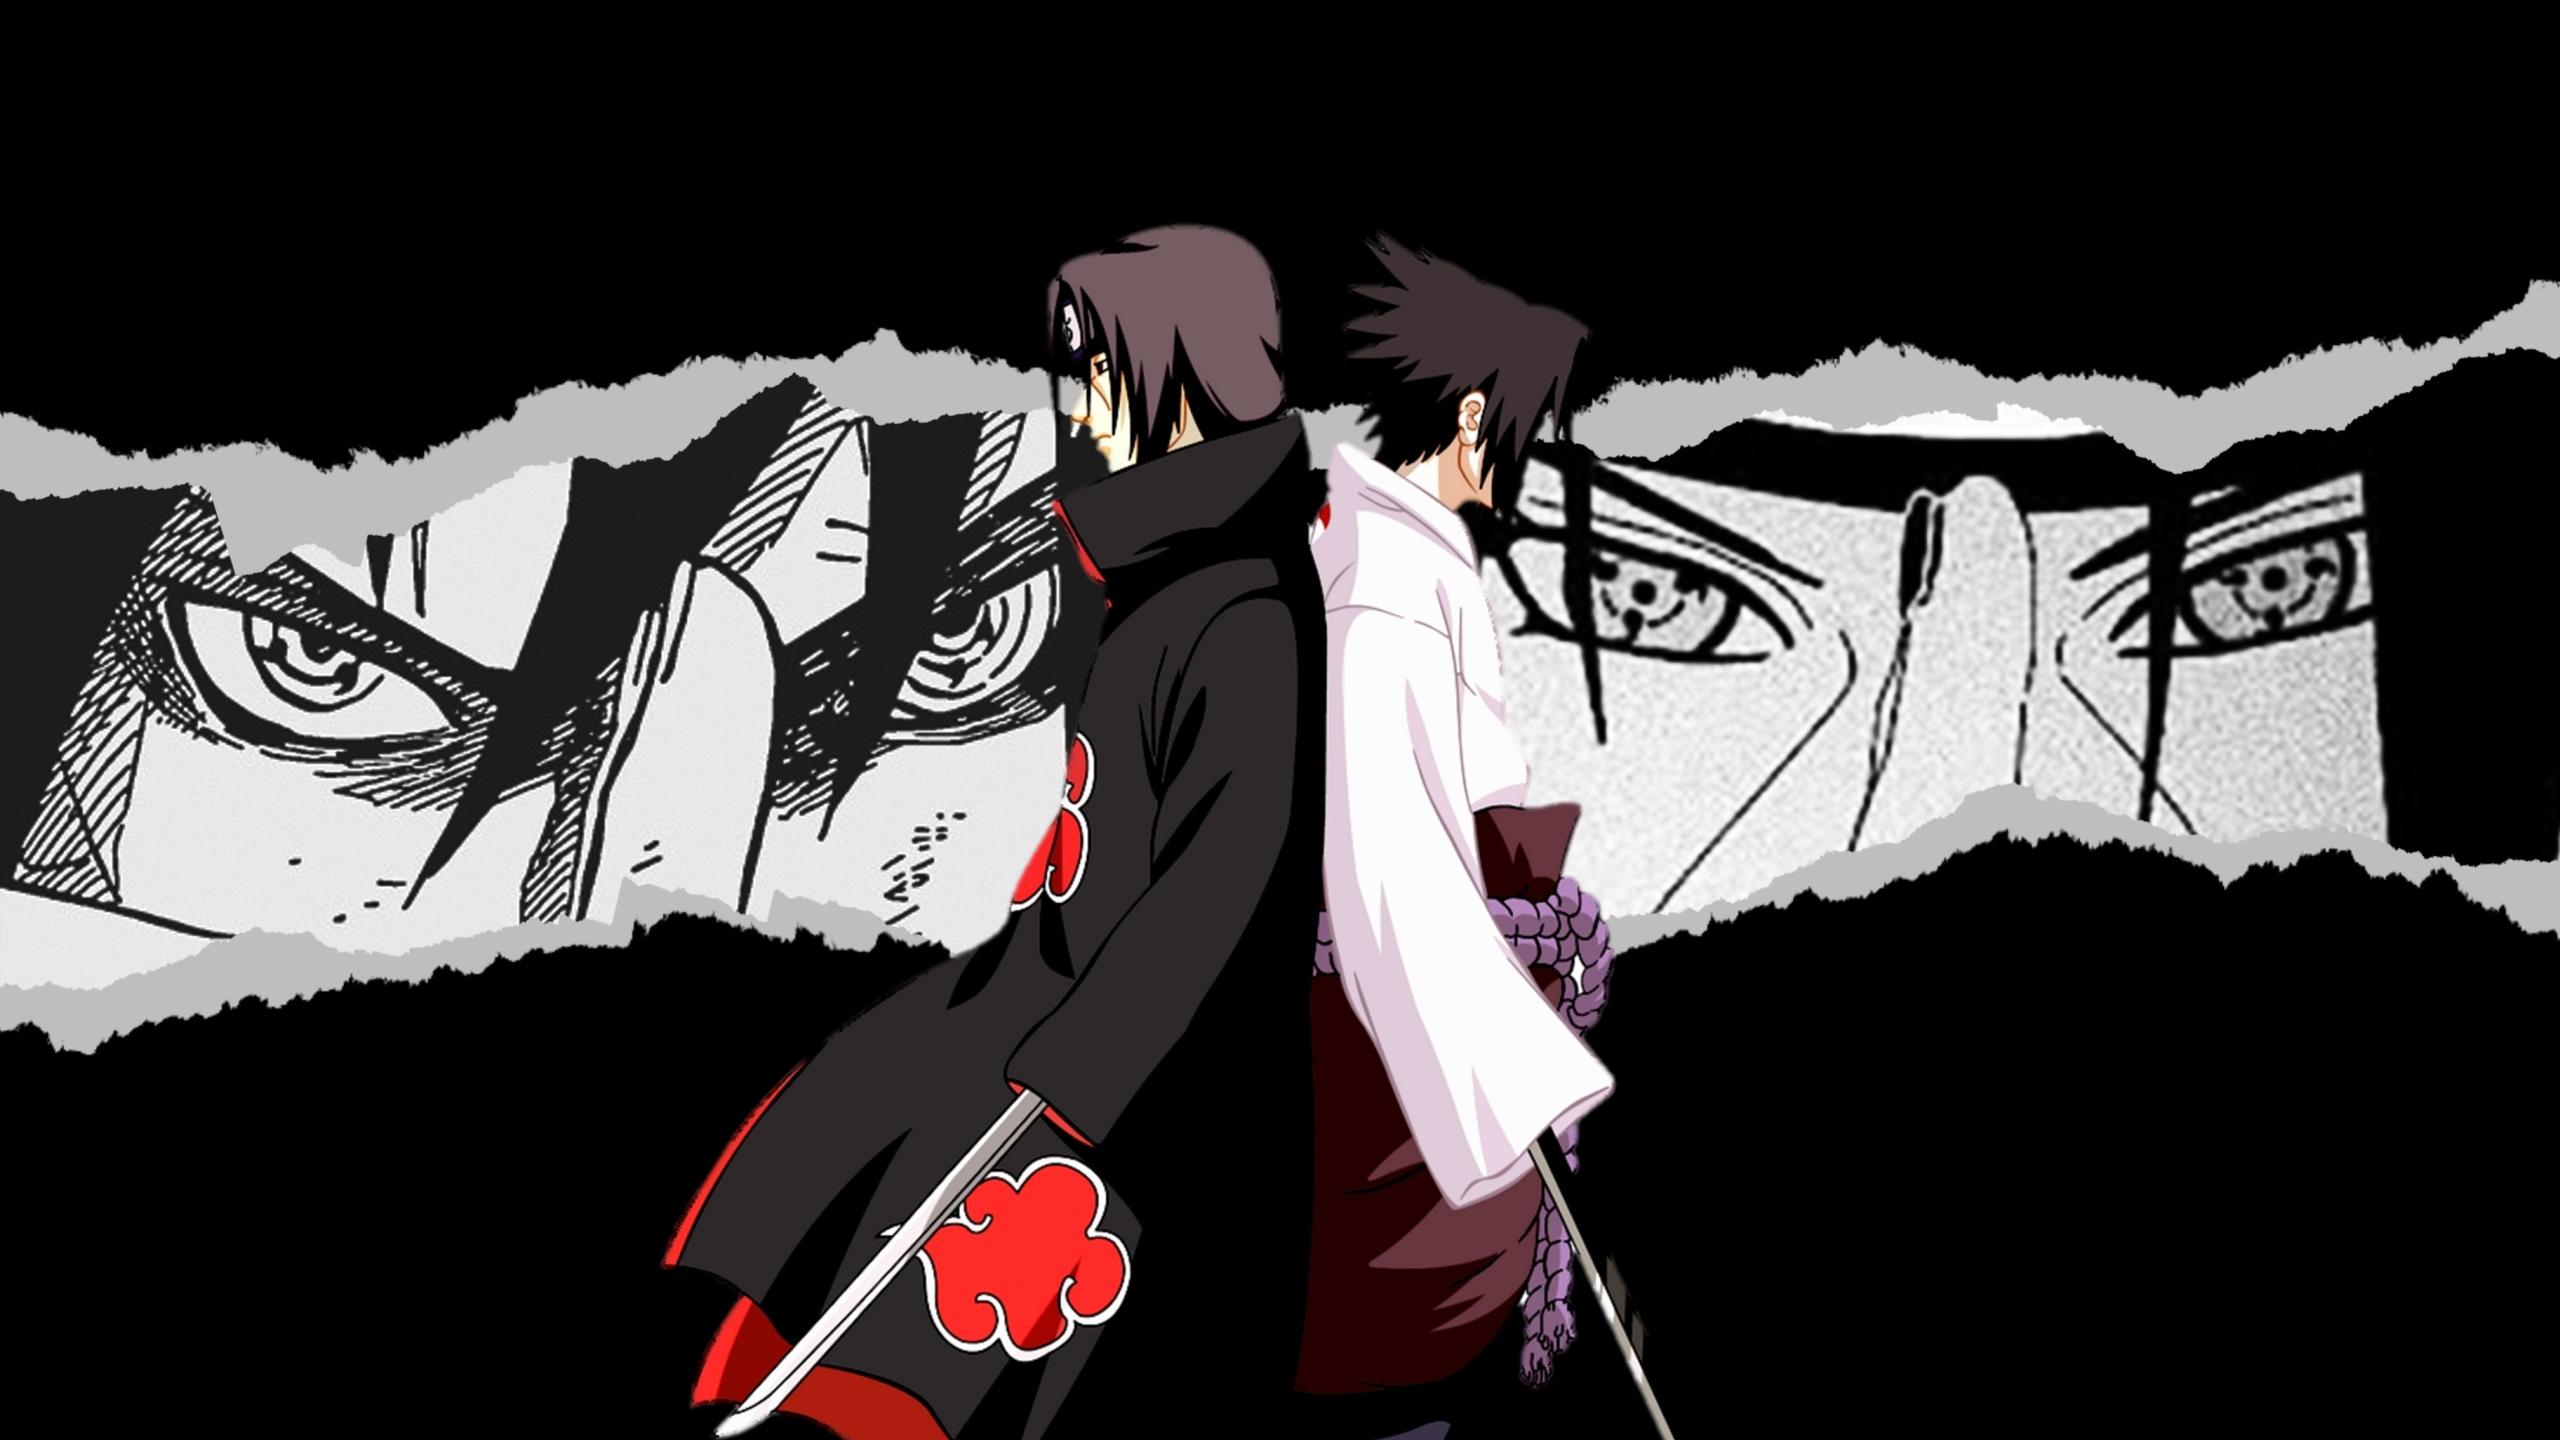 2560x1440 Itachi vs Sasuke 4K Naruto 1440P Resolution ...